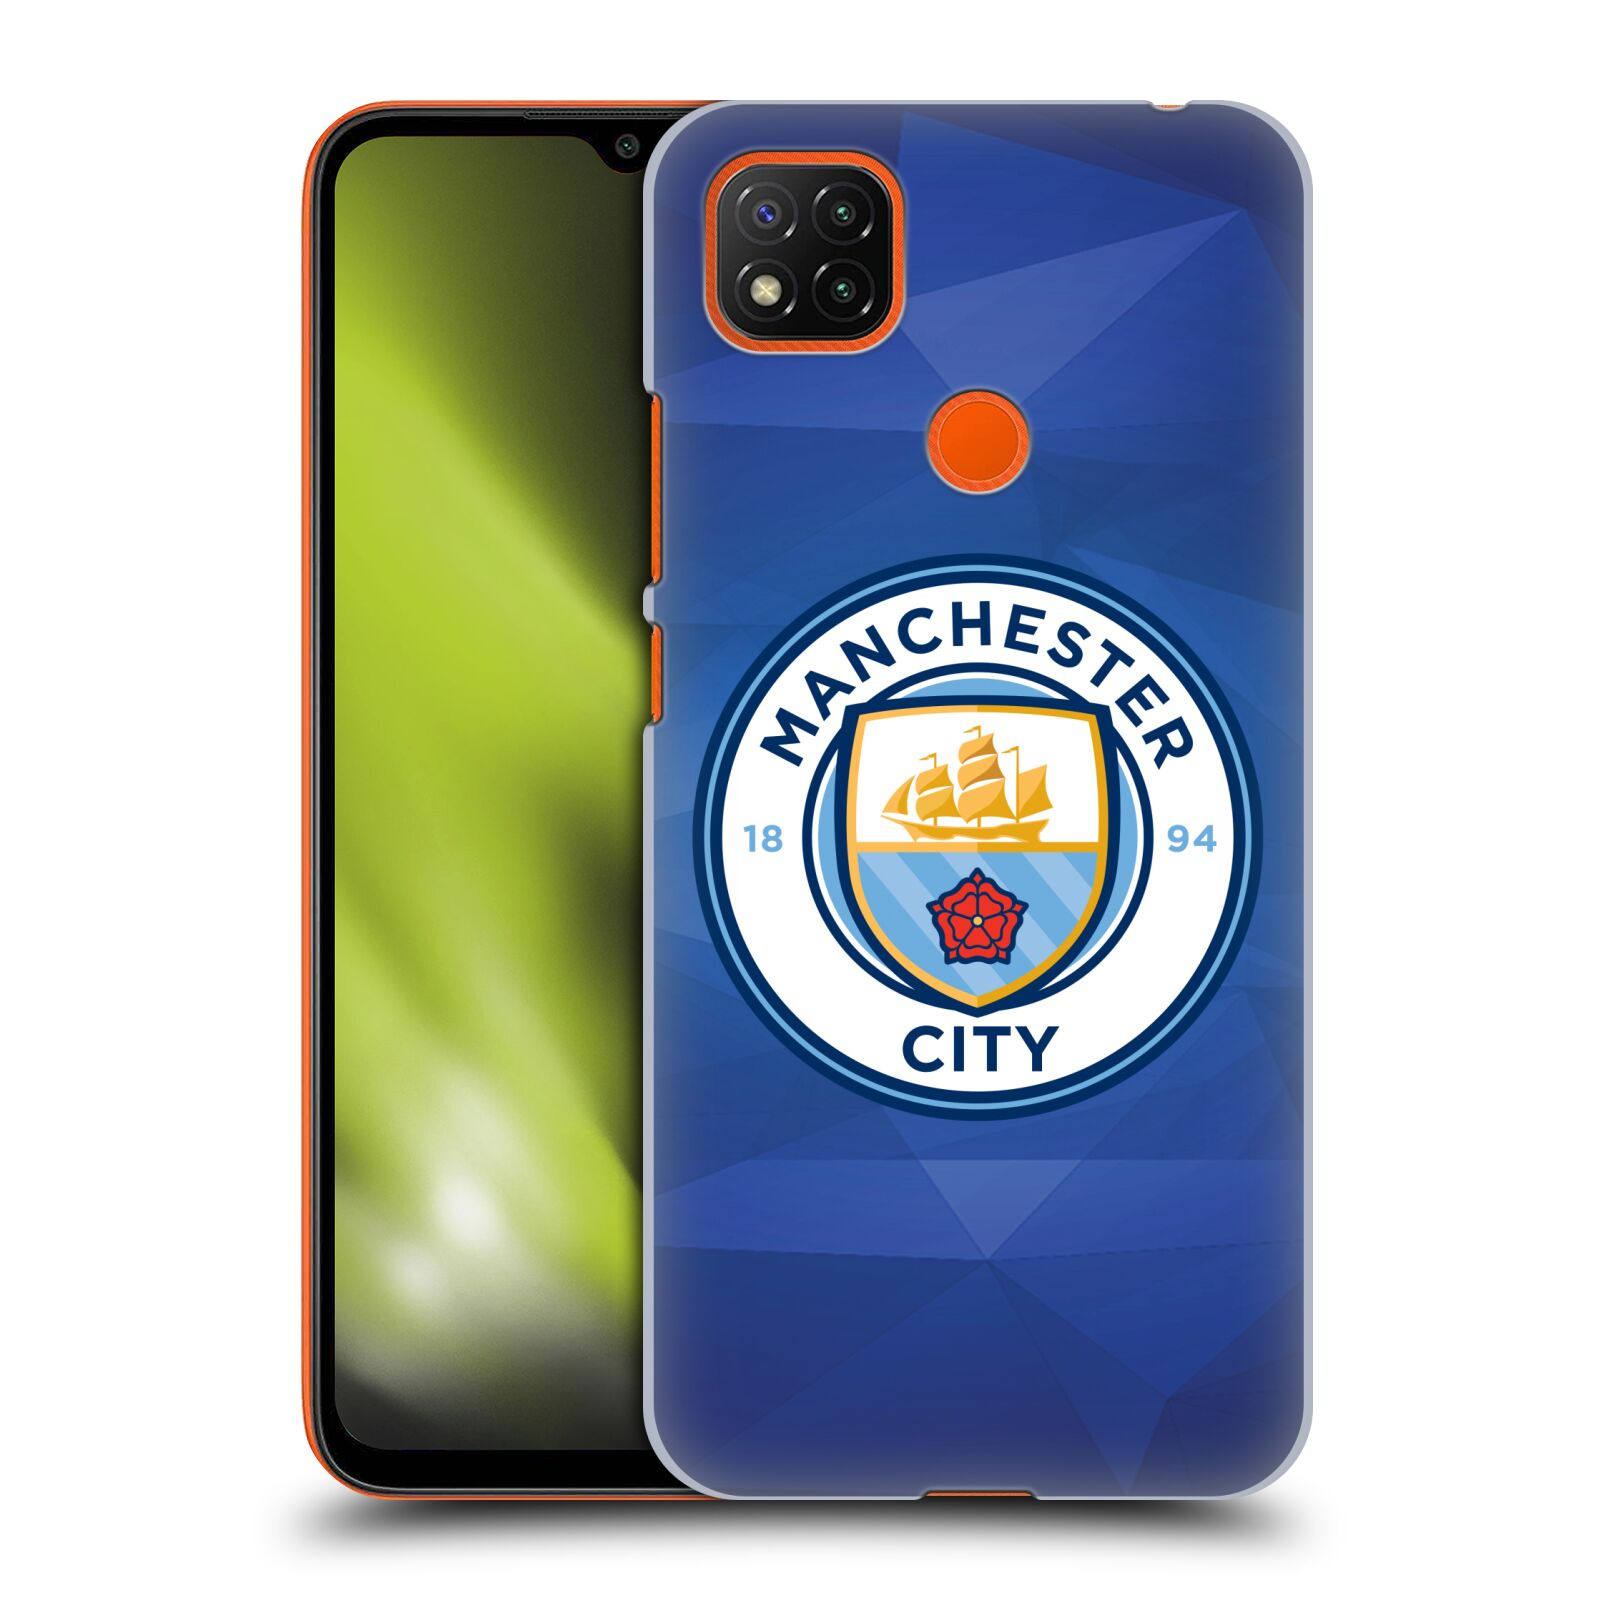 Plastové pouzdro na mobil Xiaomi Redmi 9C - Head Case - Manchester City FC - Modré nové logo